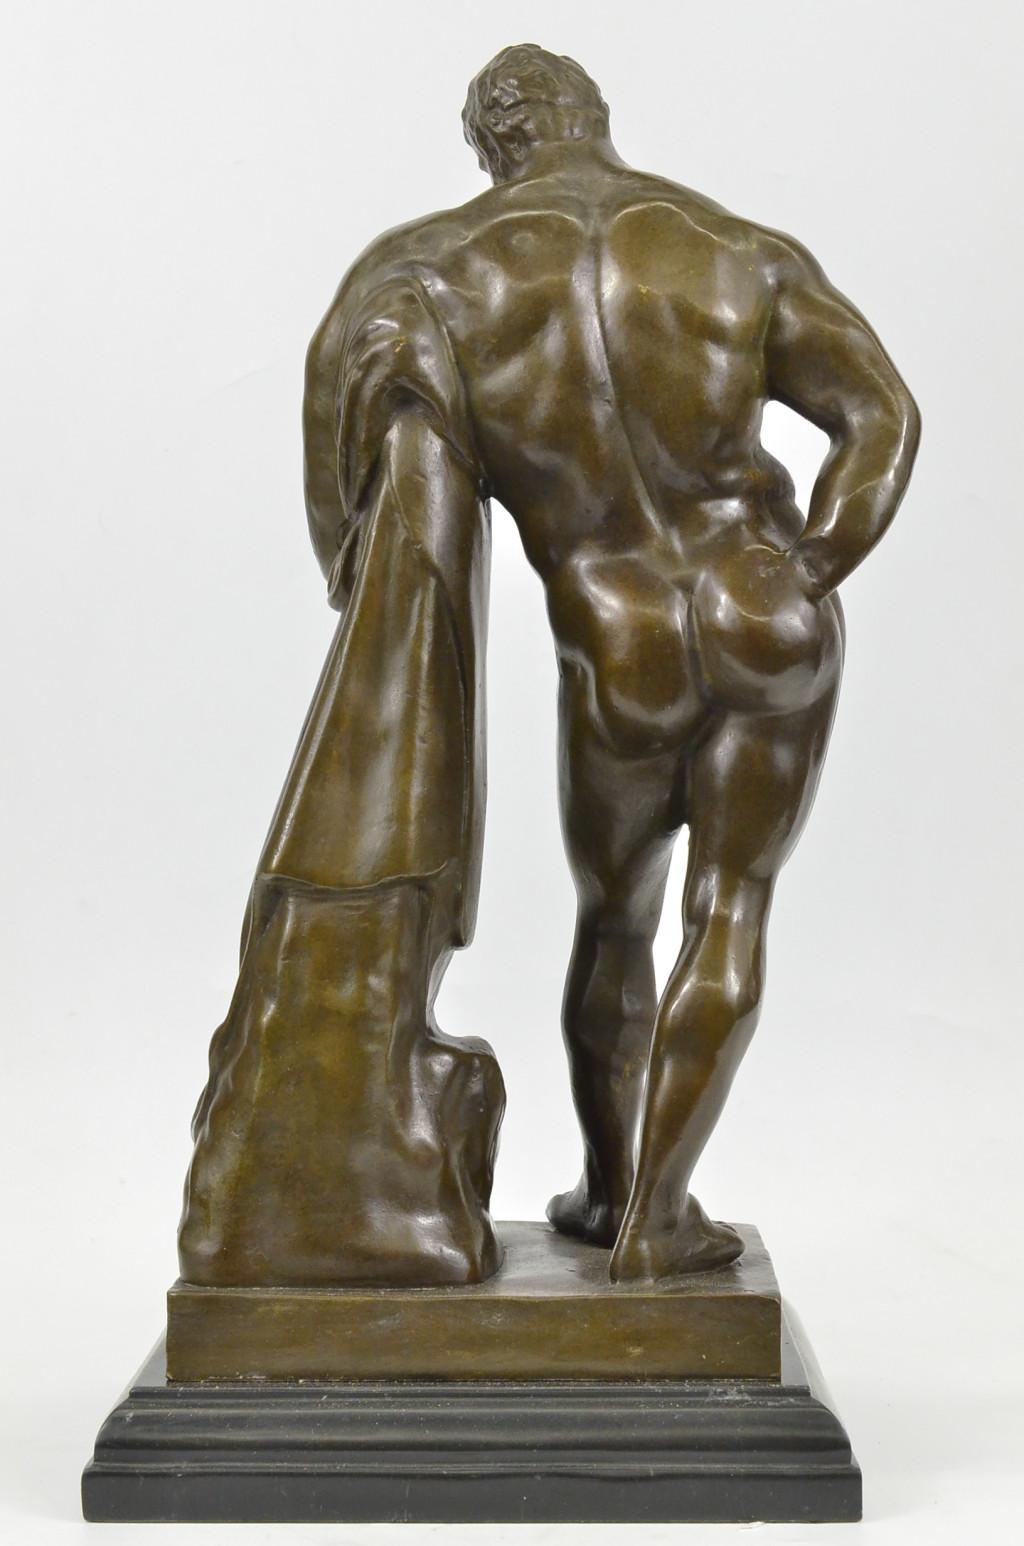 signed glycon hercules r greek myth herculesart deco bronze sculpture statue ebay. Black Bedroom Furniture Sets. Home Design Ideas